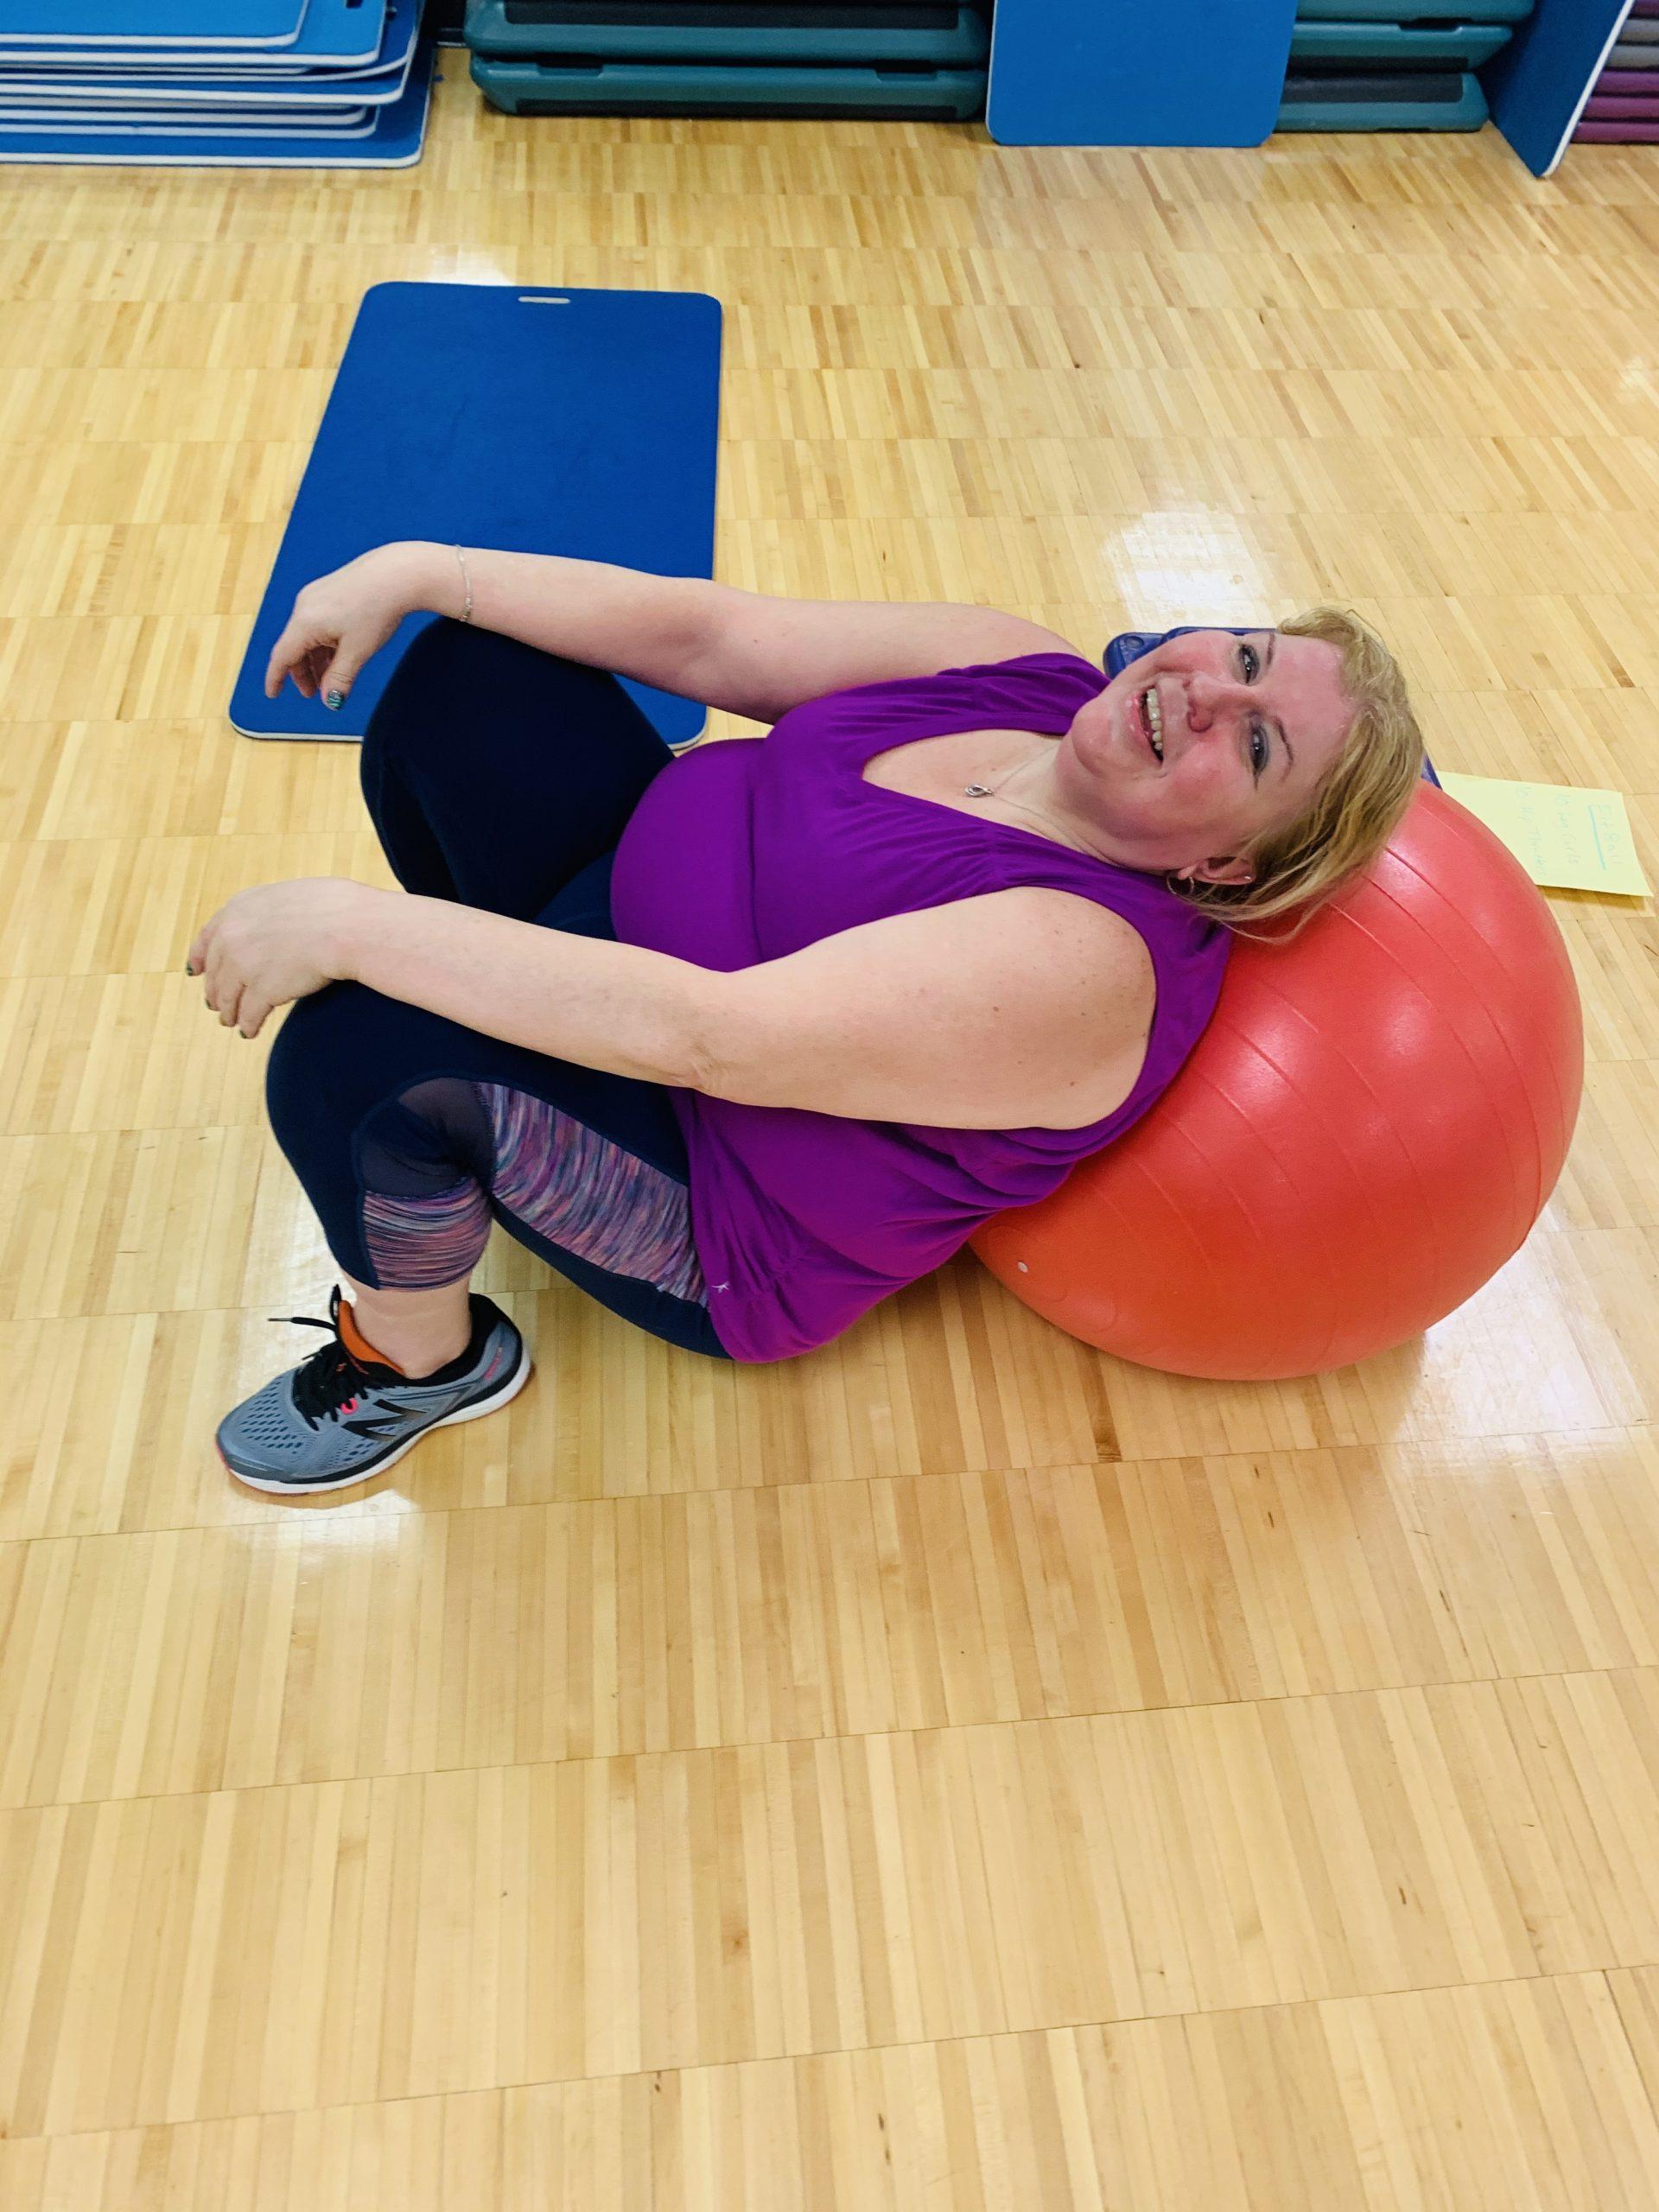 woman on exercise ball